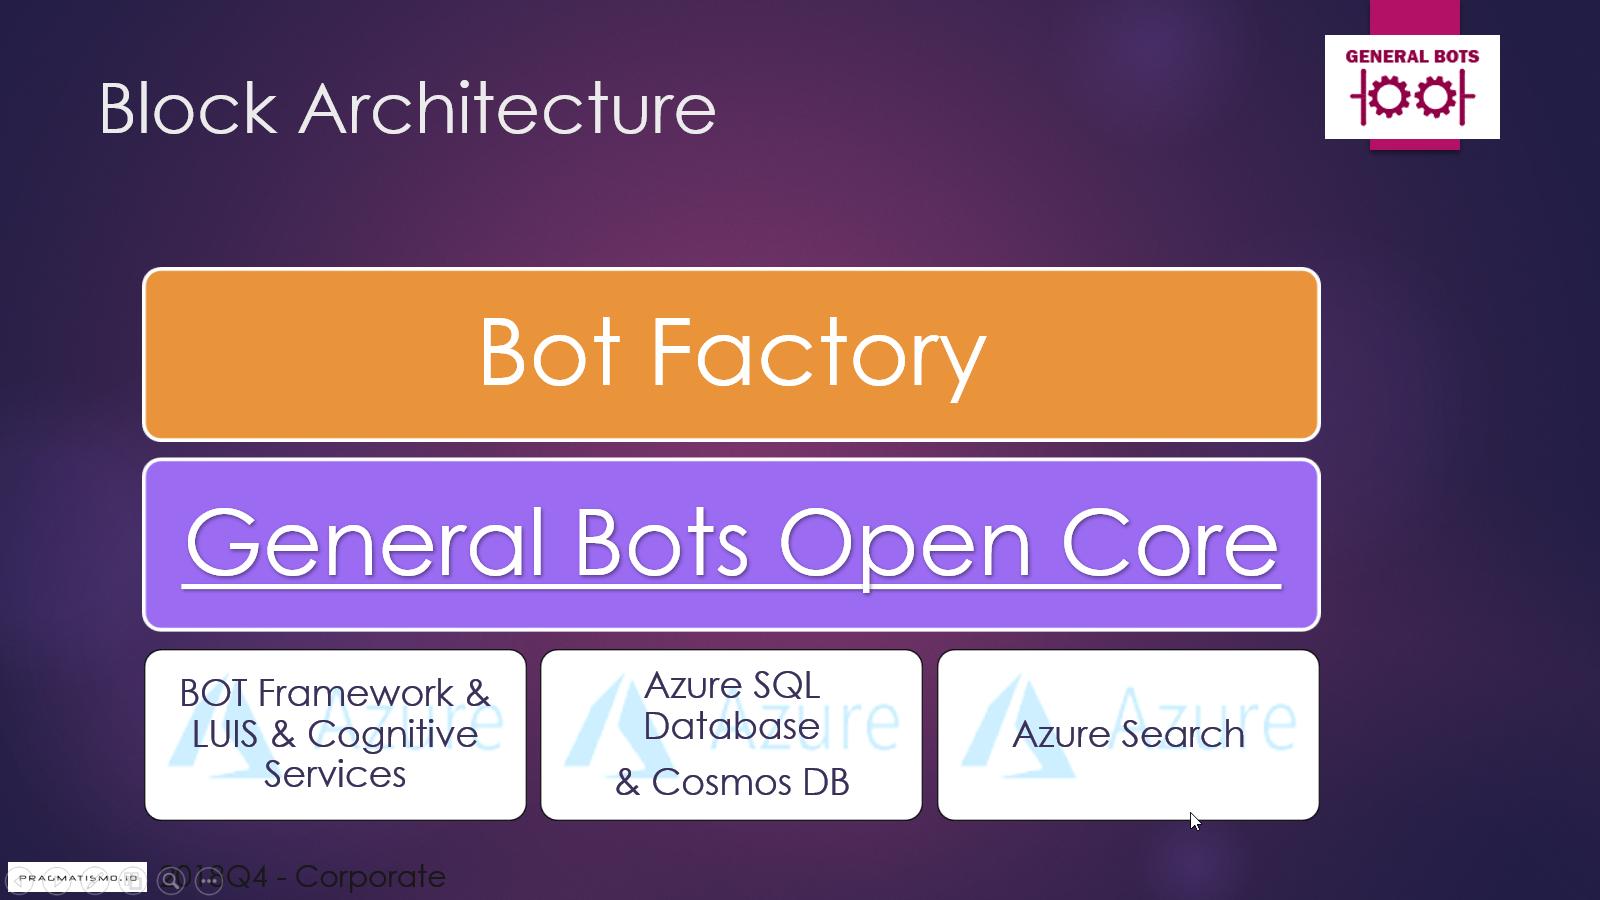 General Bots Block Architecture